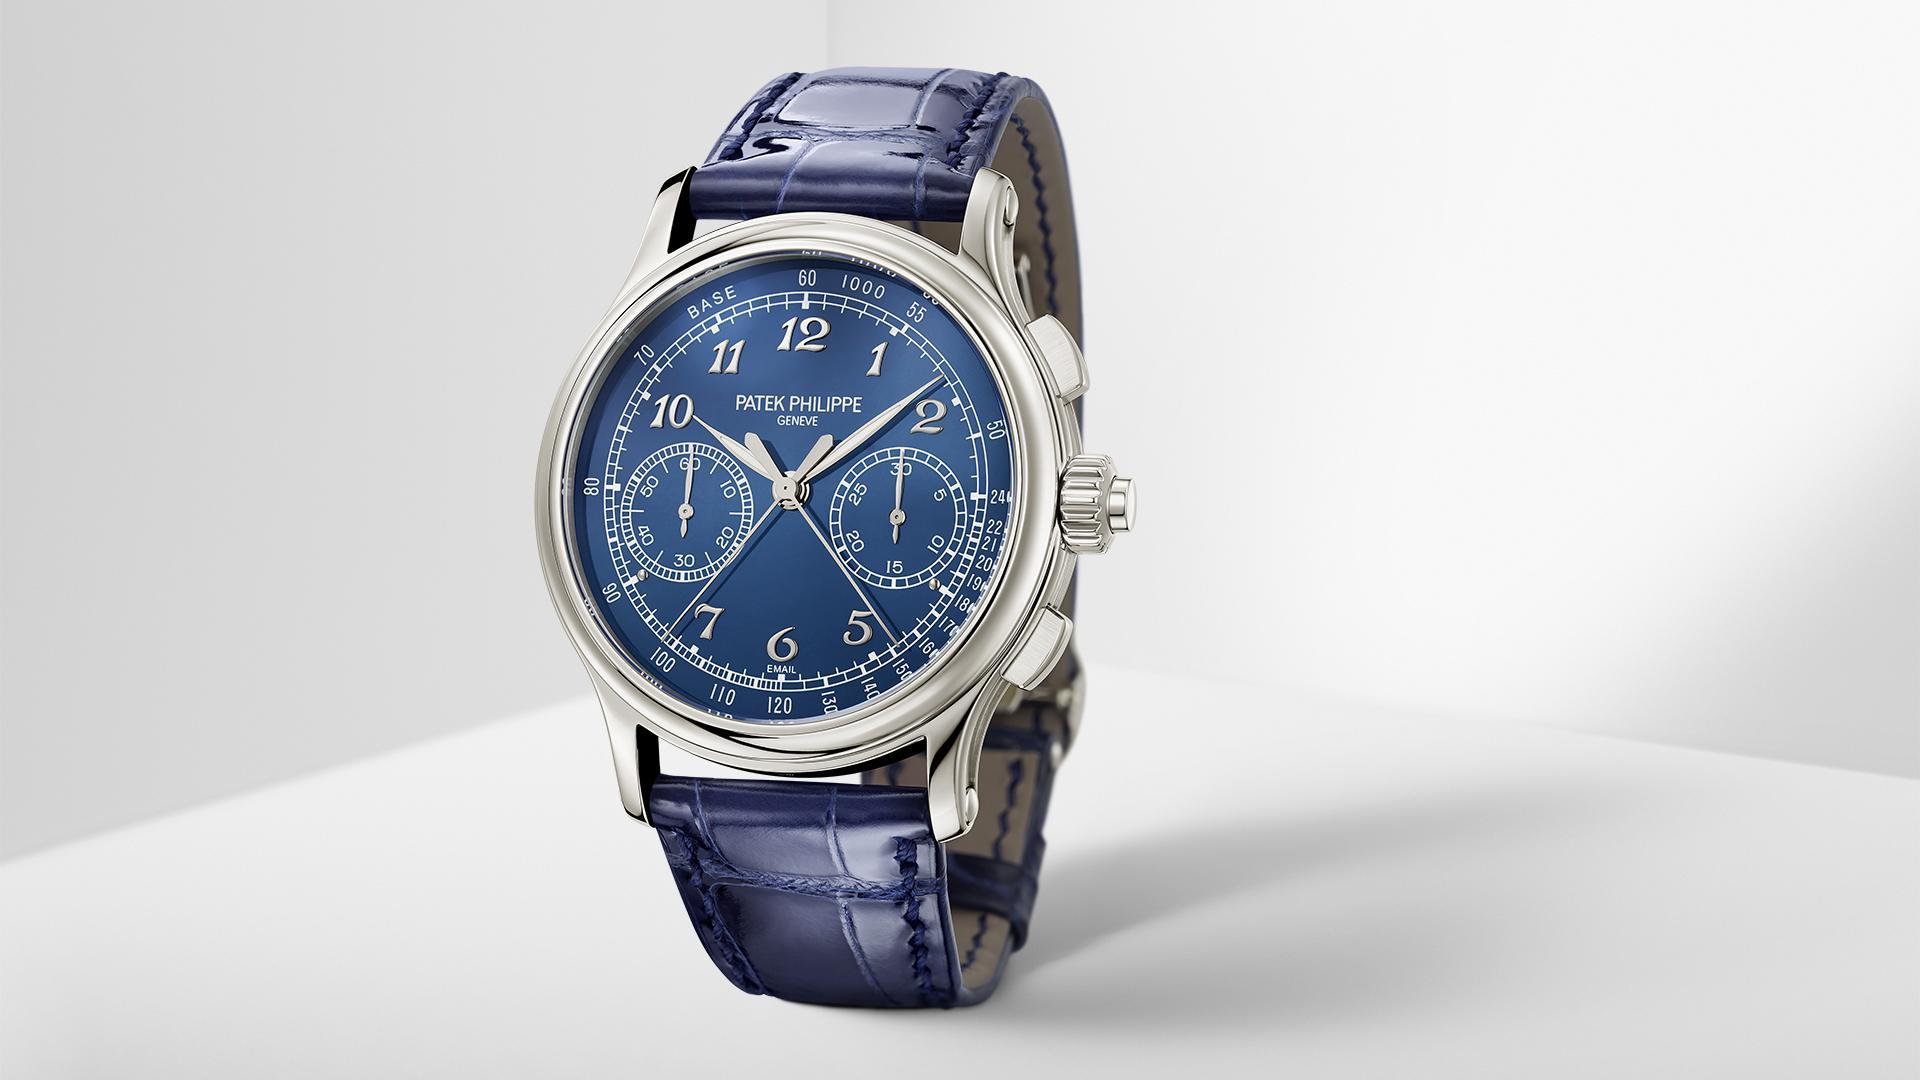 Patek Philippe Ref. 5370P-011 Split-Seconds Chronograph watch